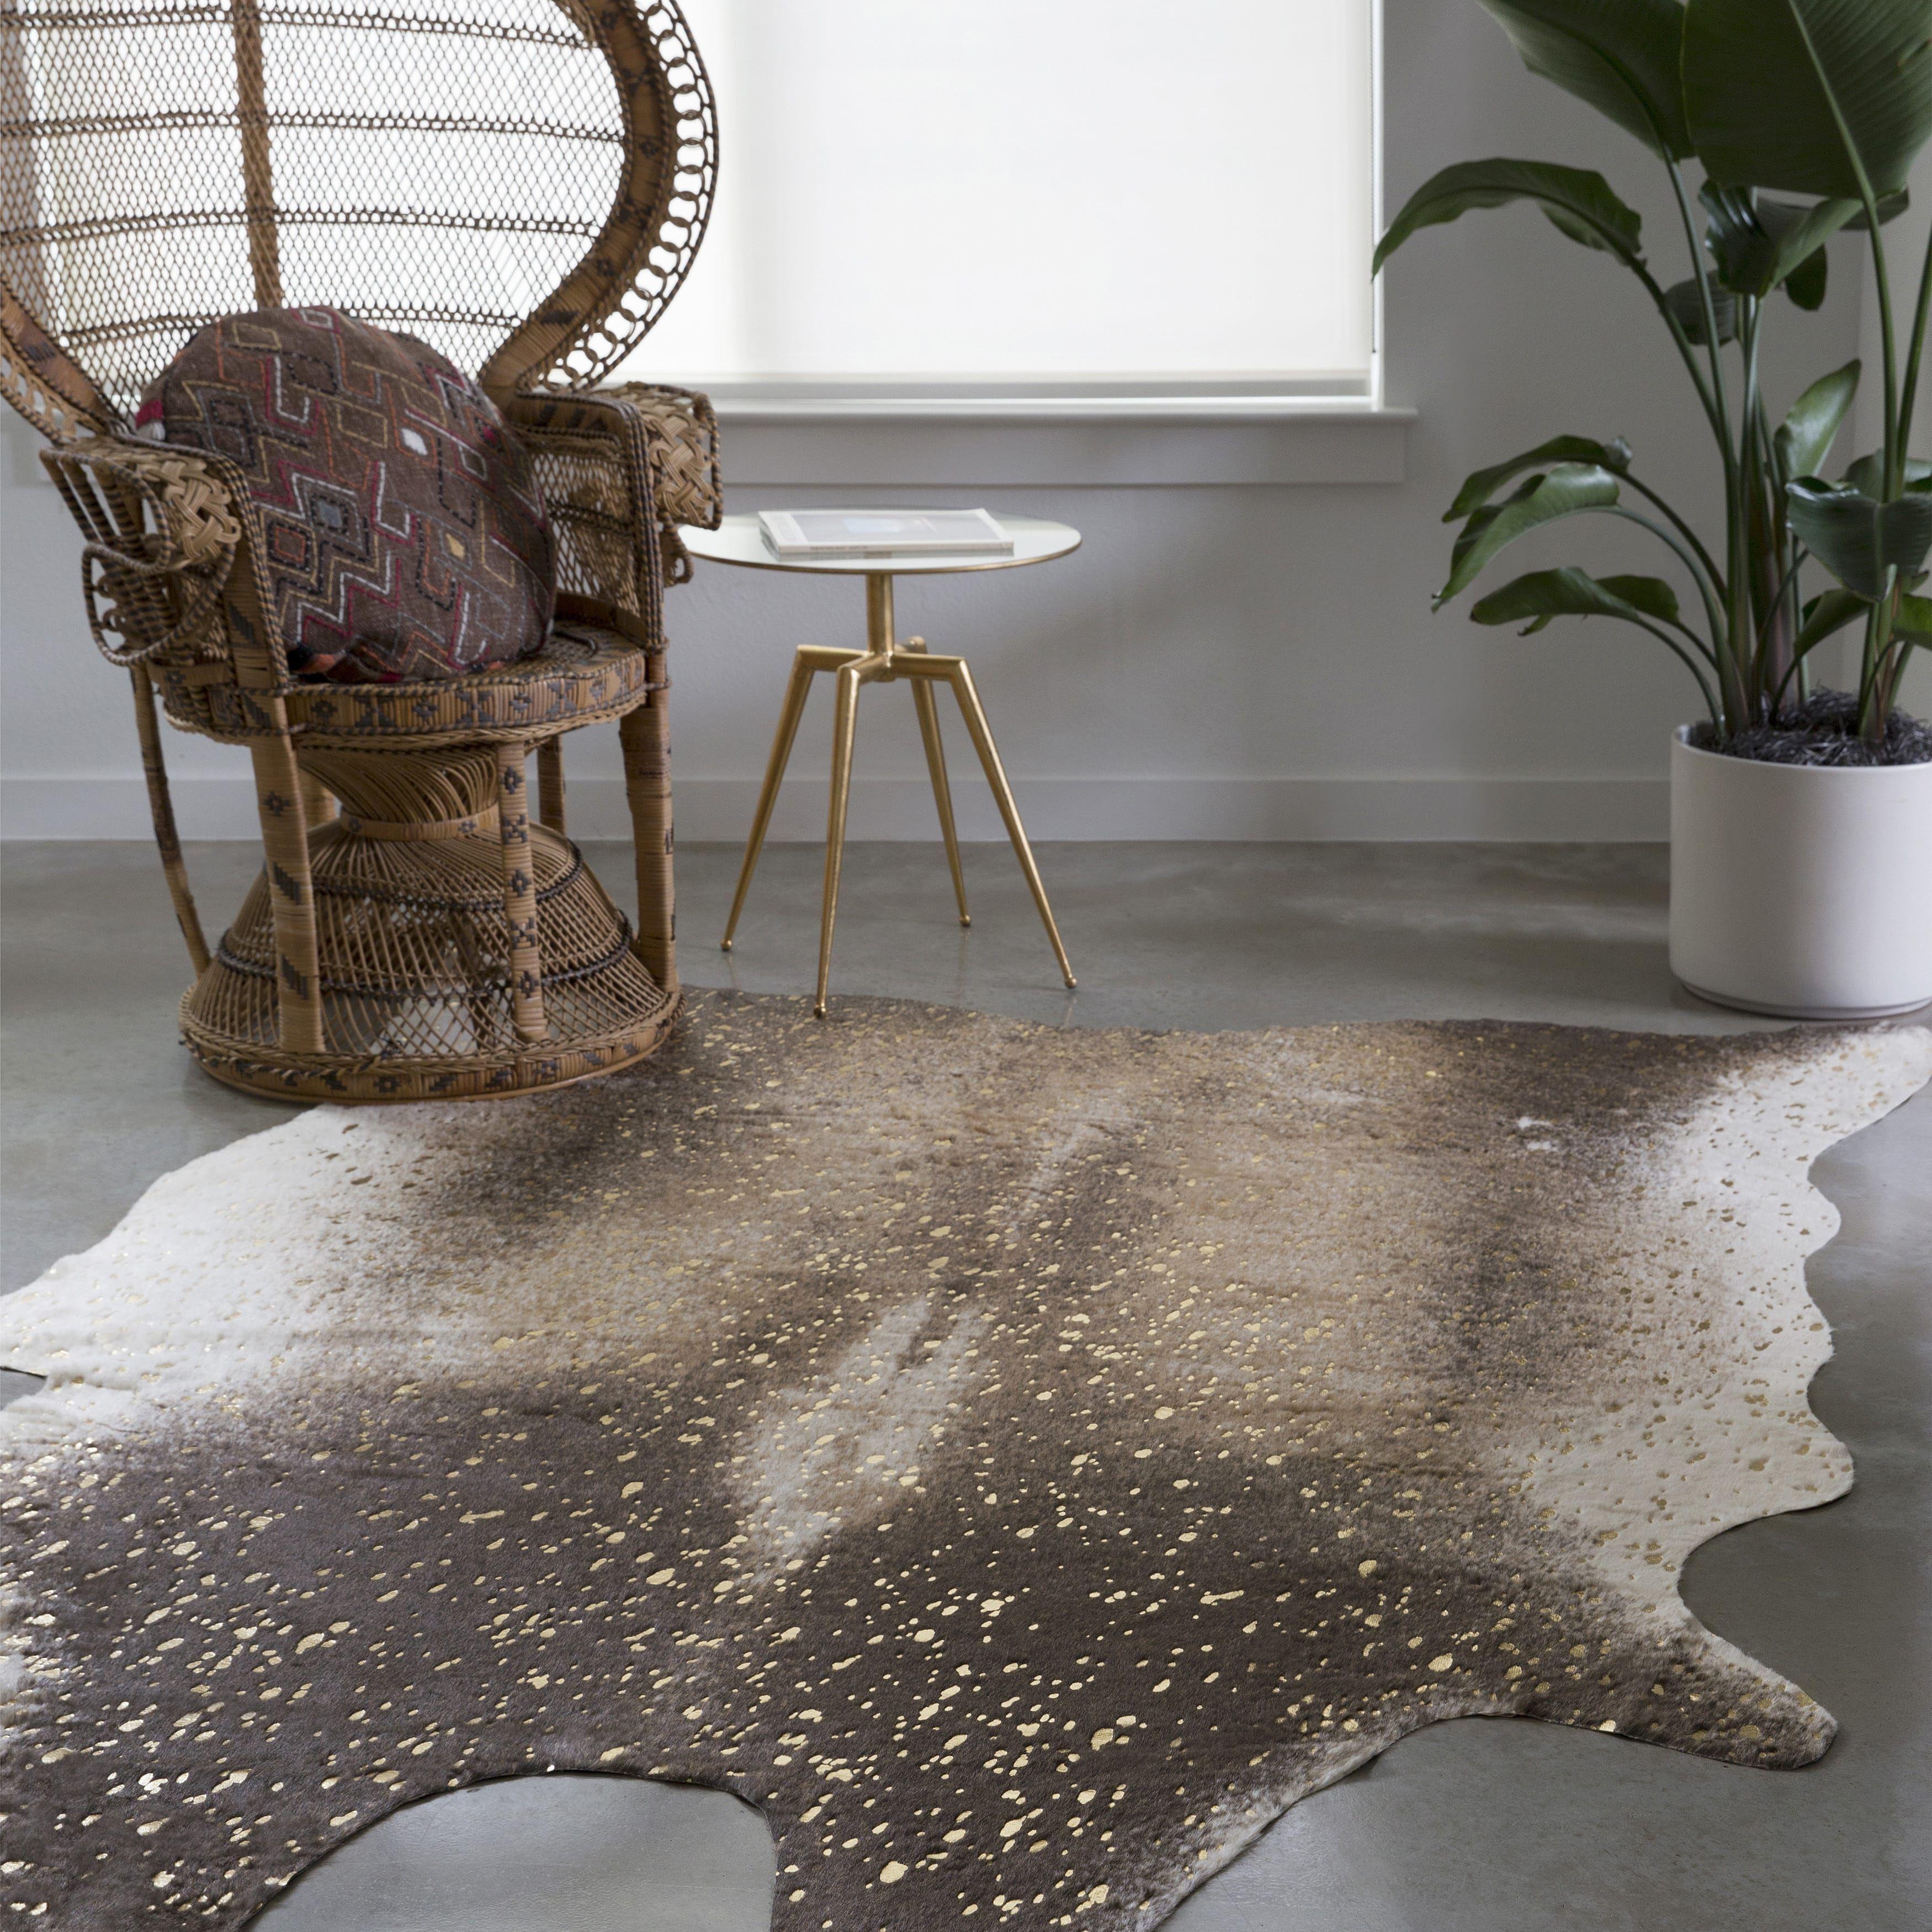 surprising cool tips minimalist home decorating wood minimalist